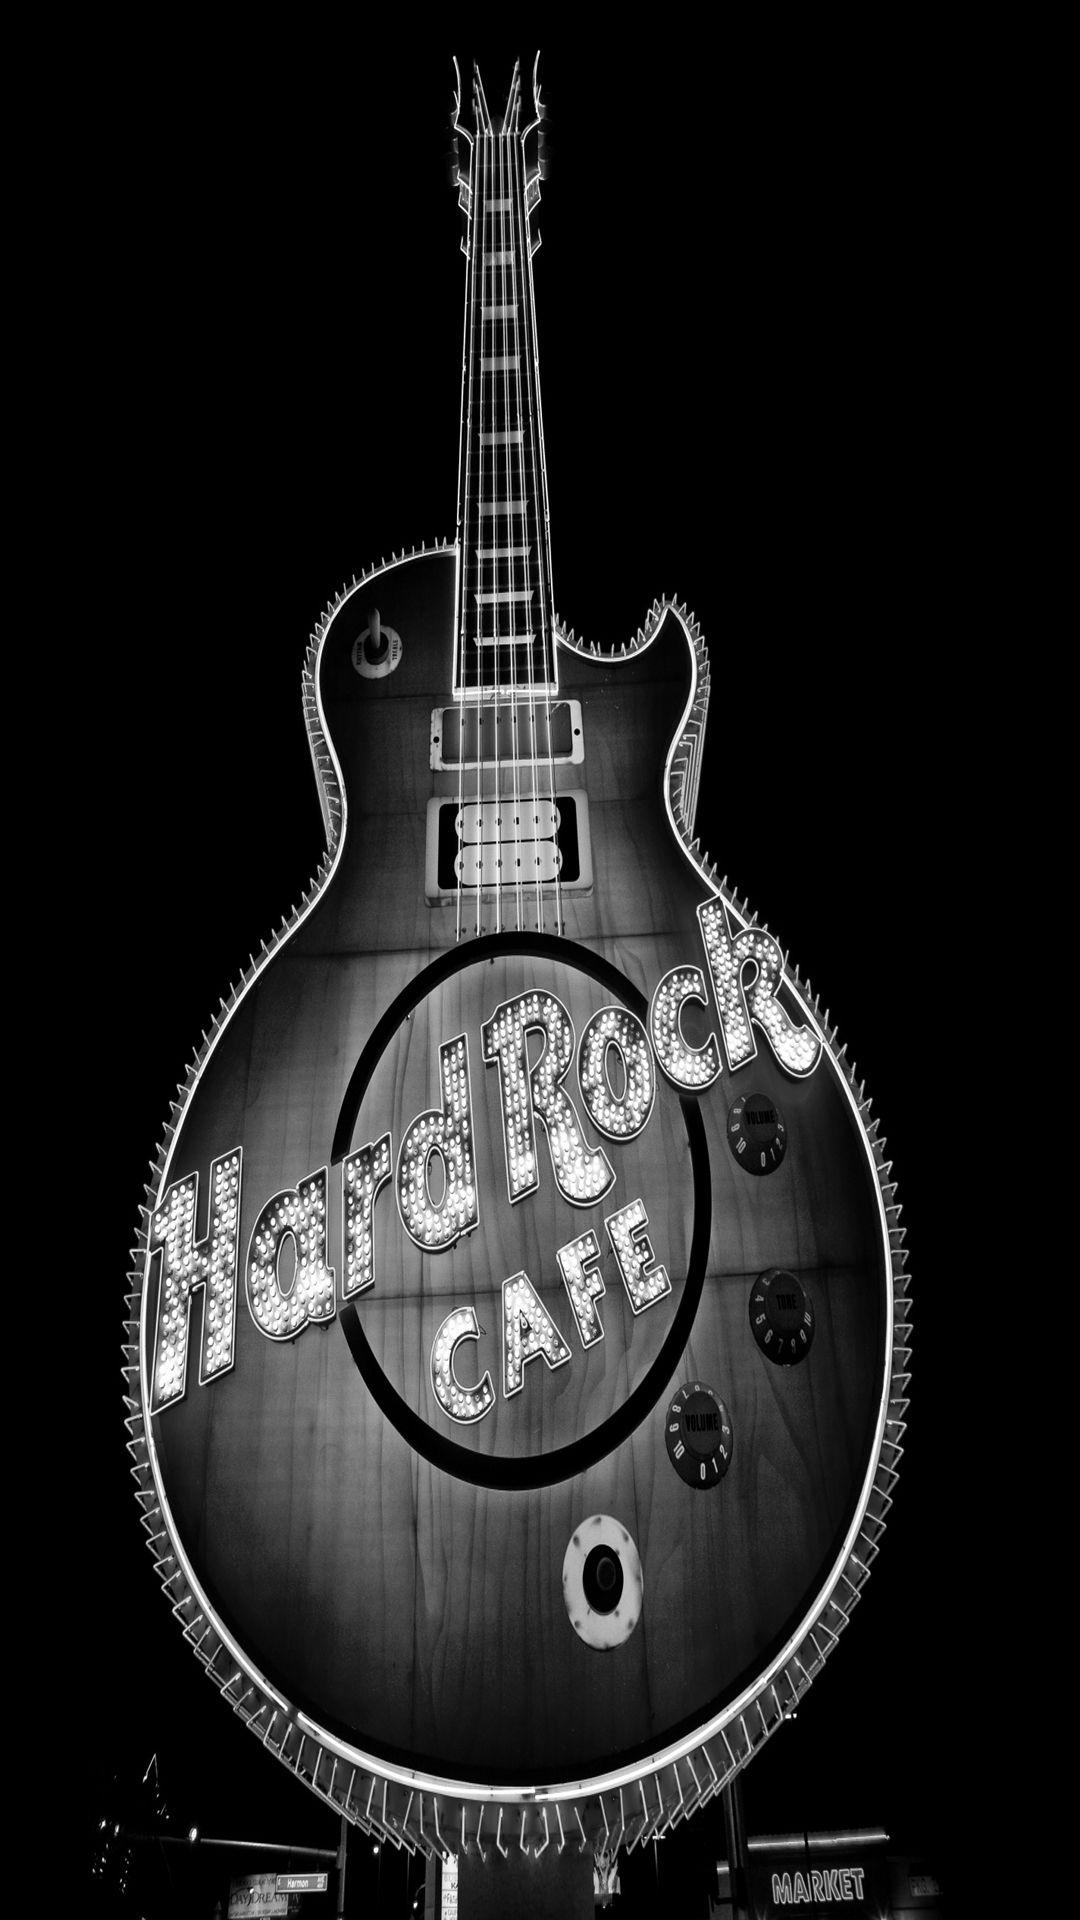 Guitar Black Background